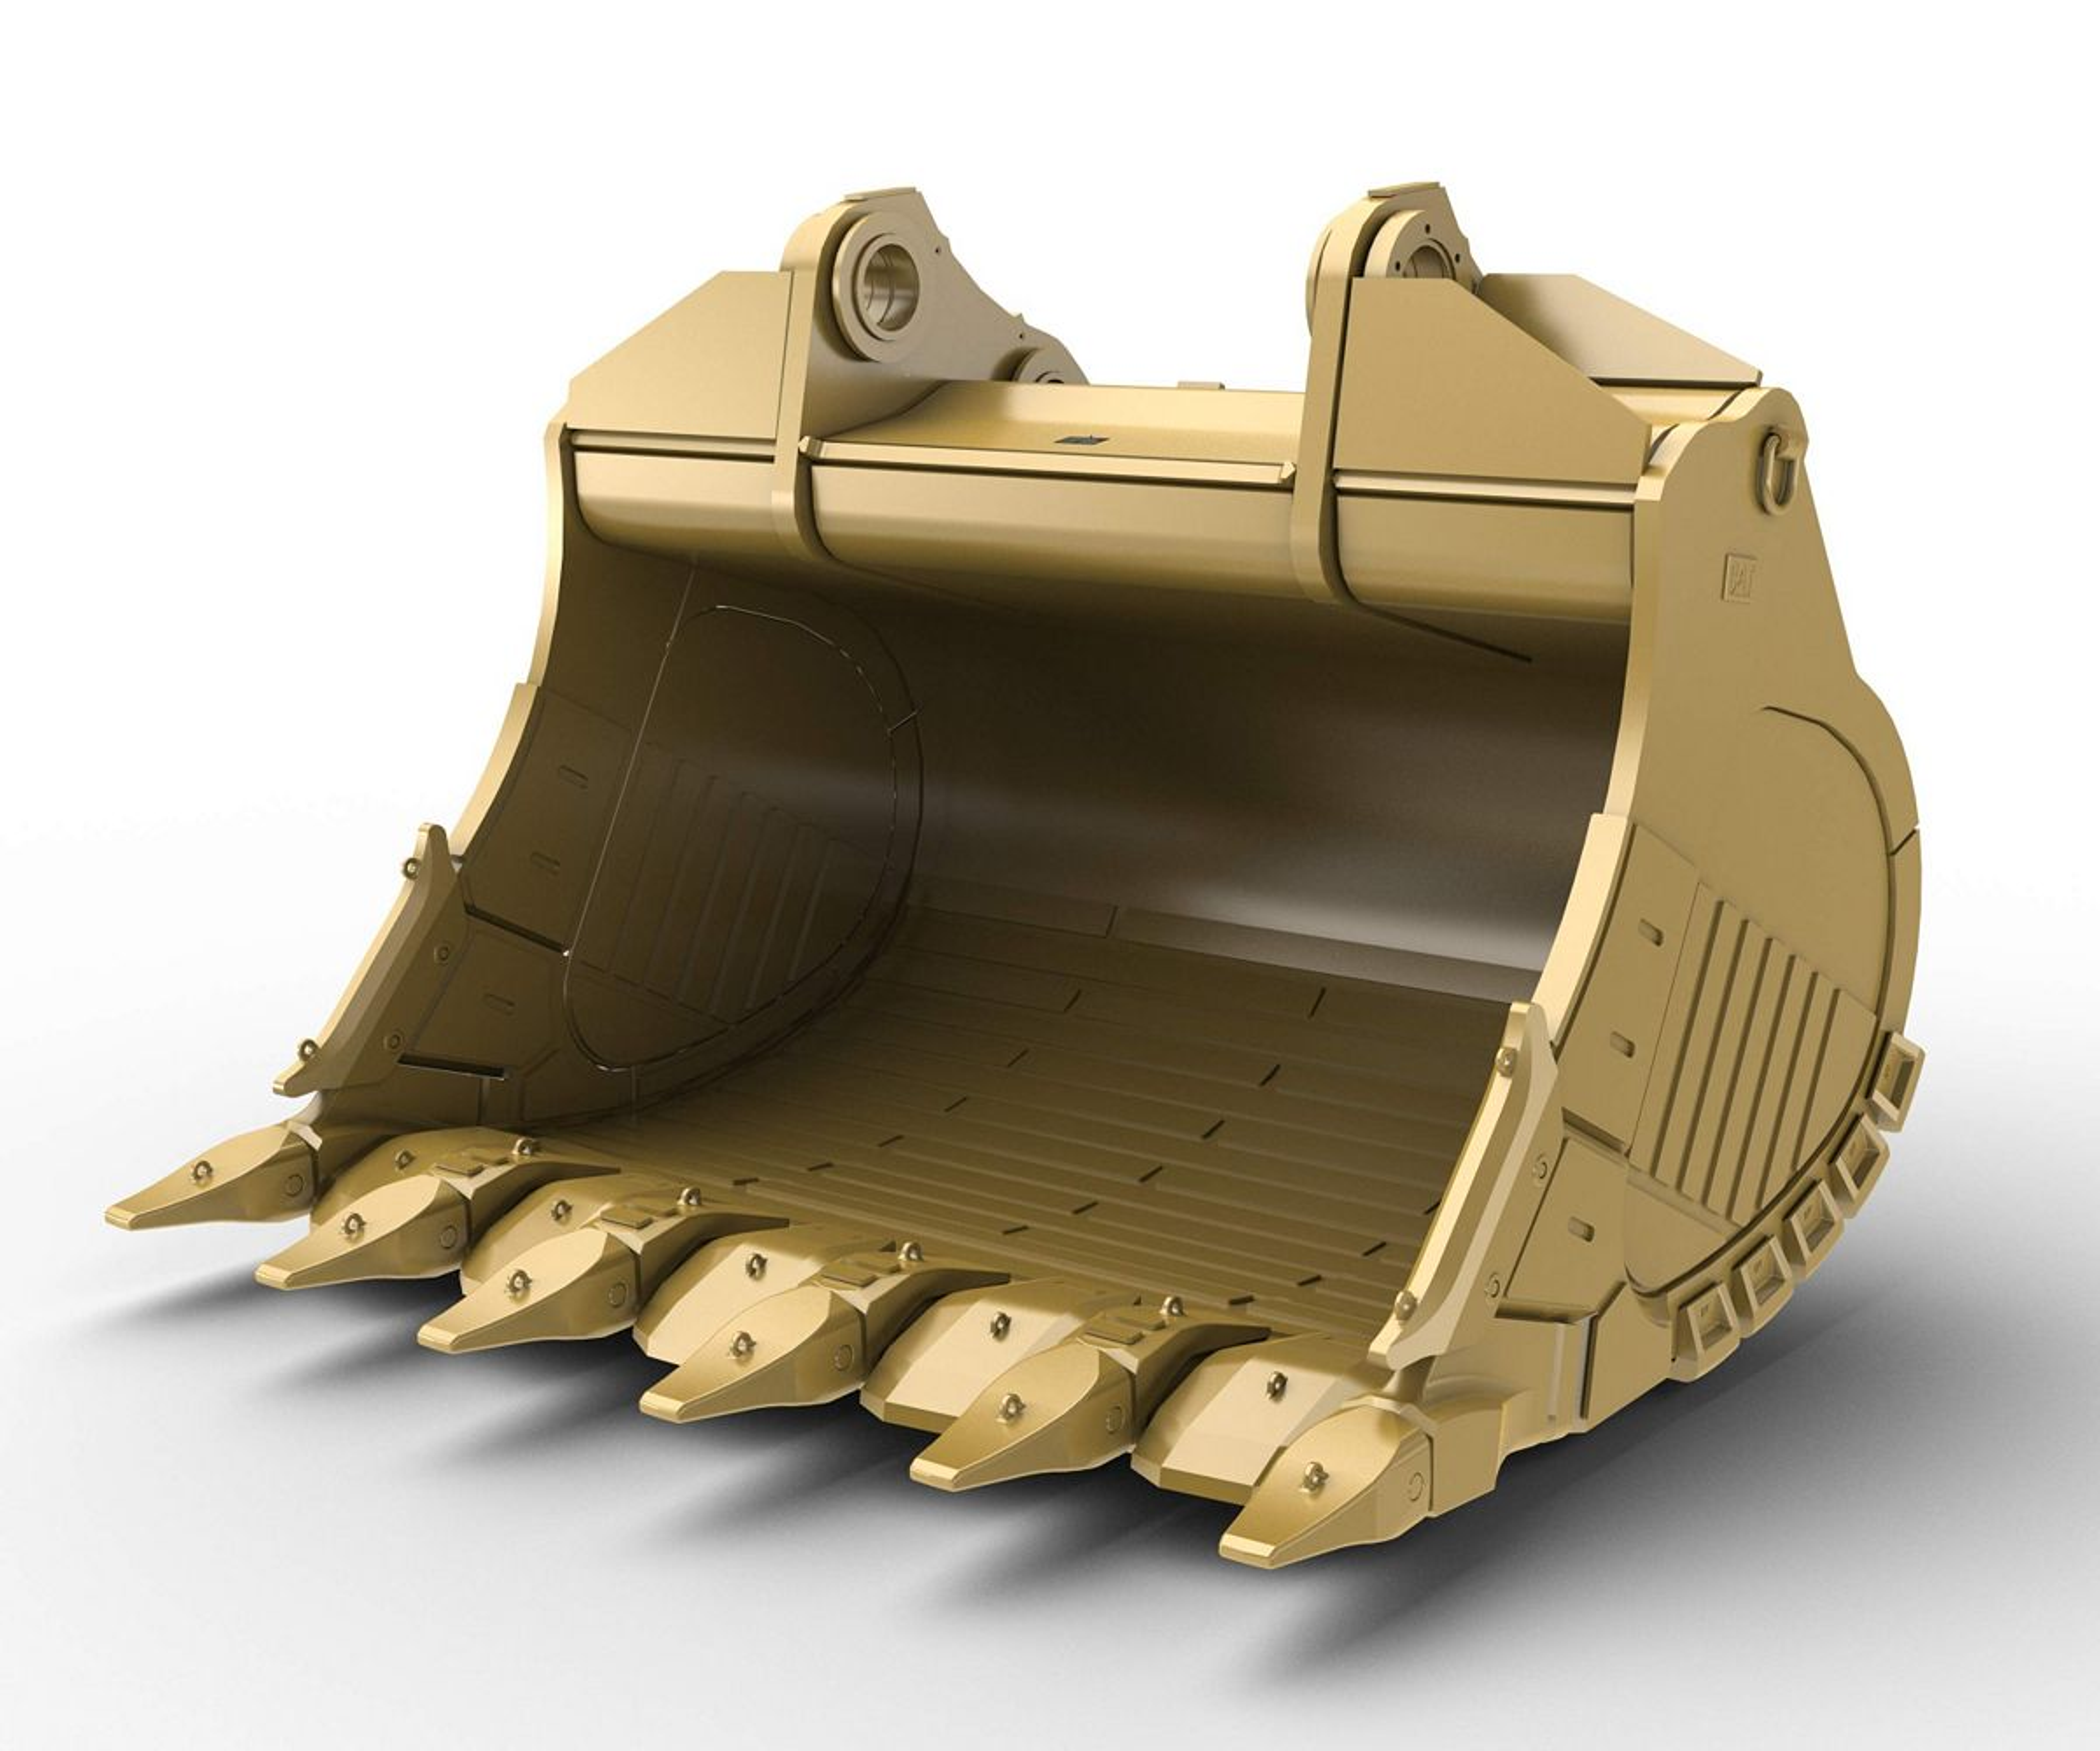 20m³ (26.2yd³) Heavy Rock bucket for the 6040 Hyd Mining Shovel